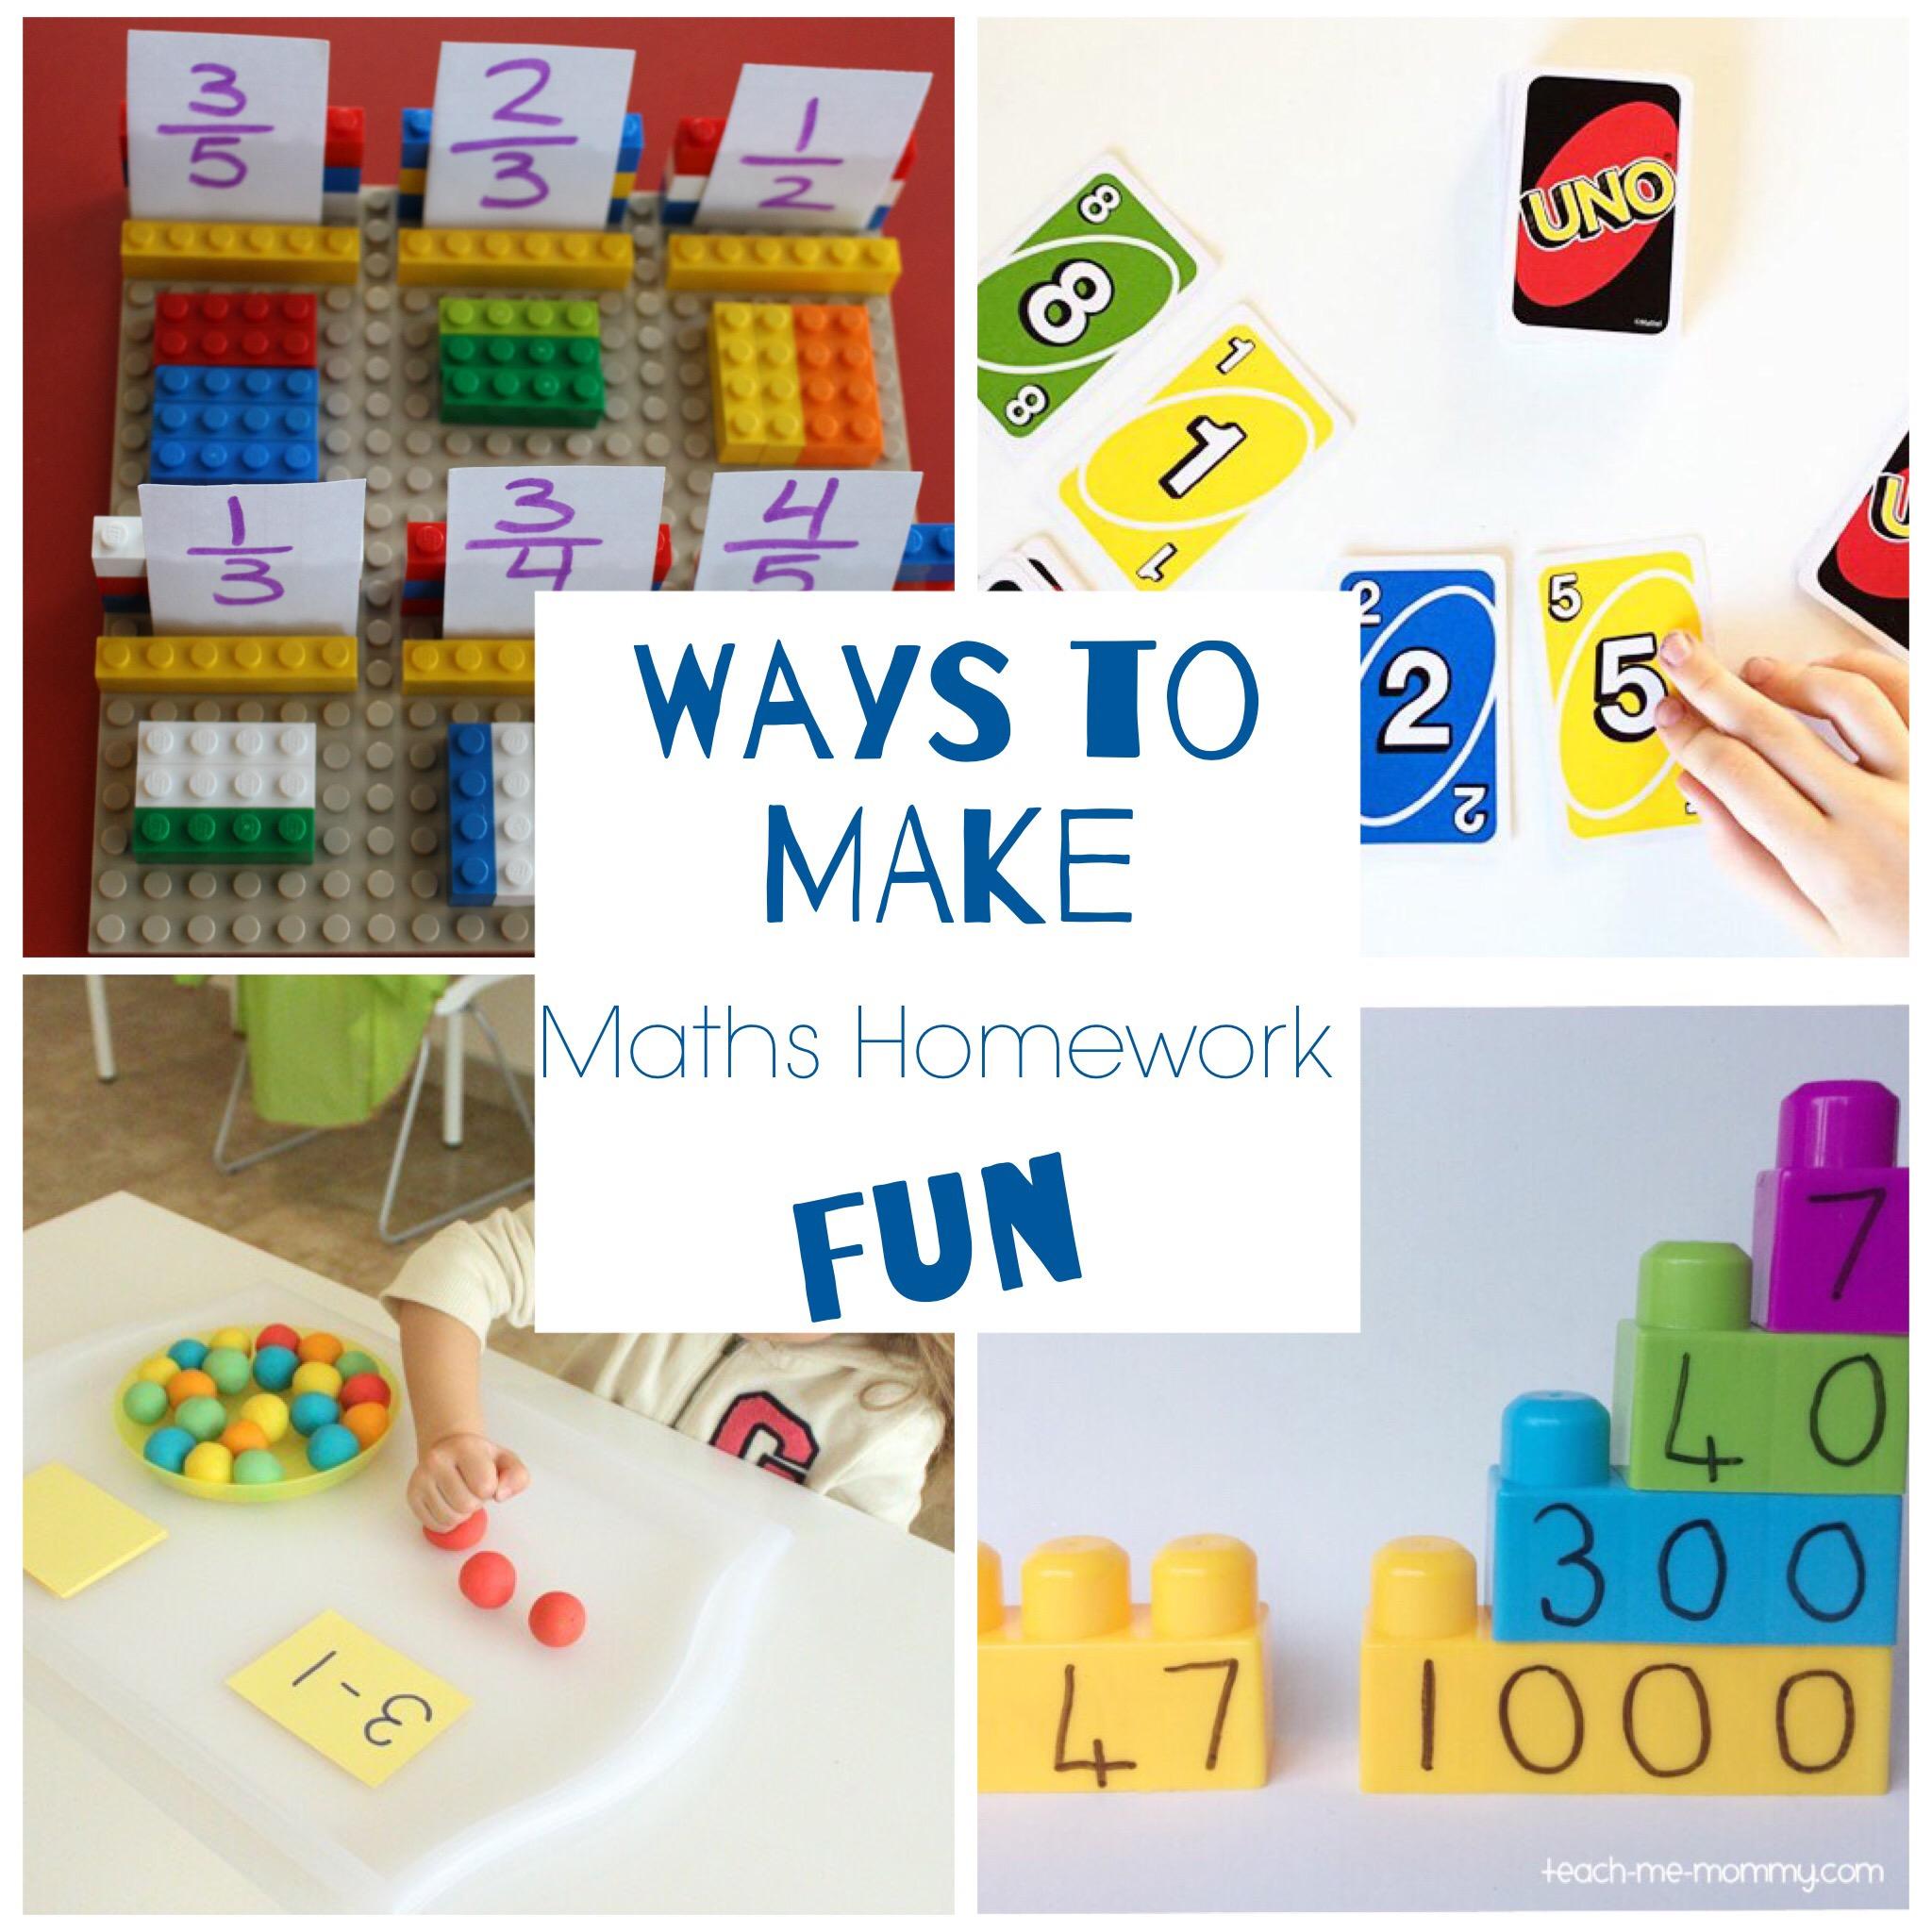 Ways to Make Maths Homework Fun - Teach Me Mommy